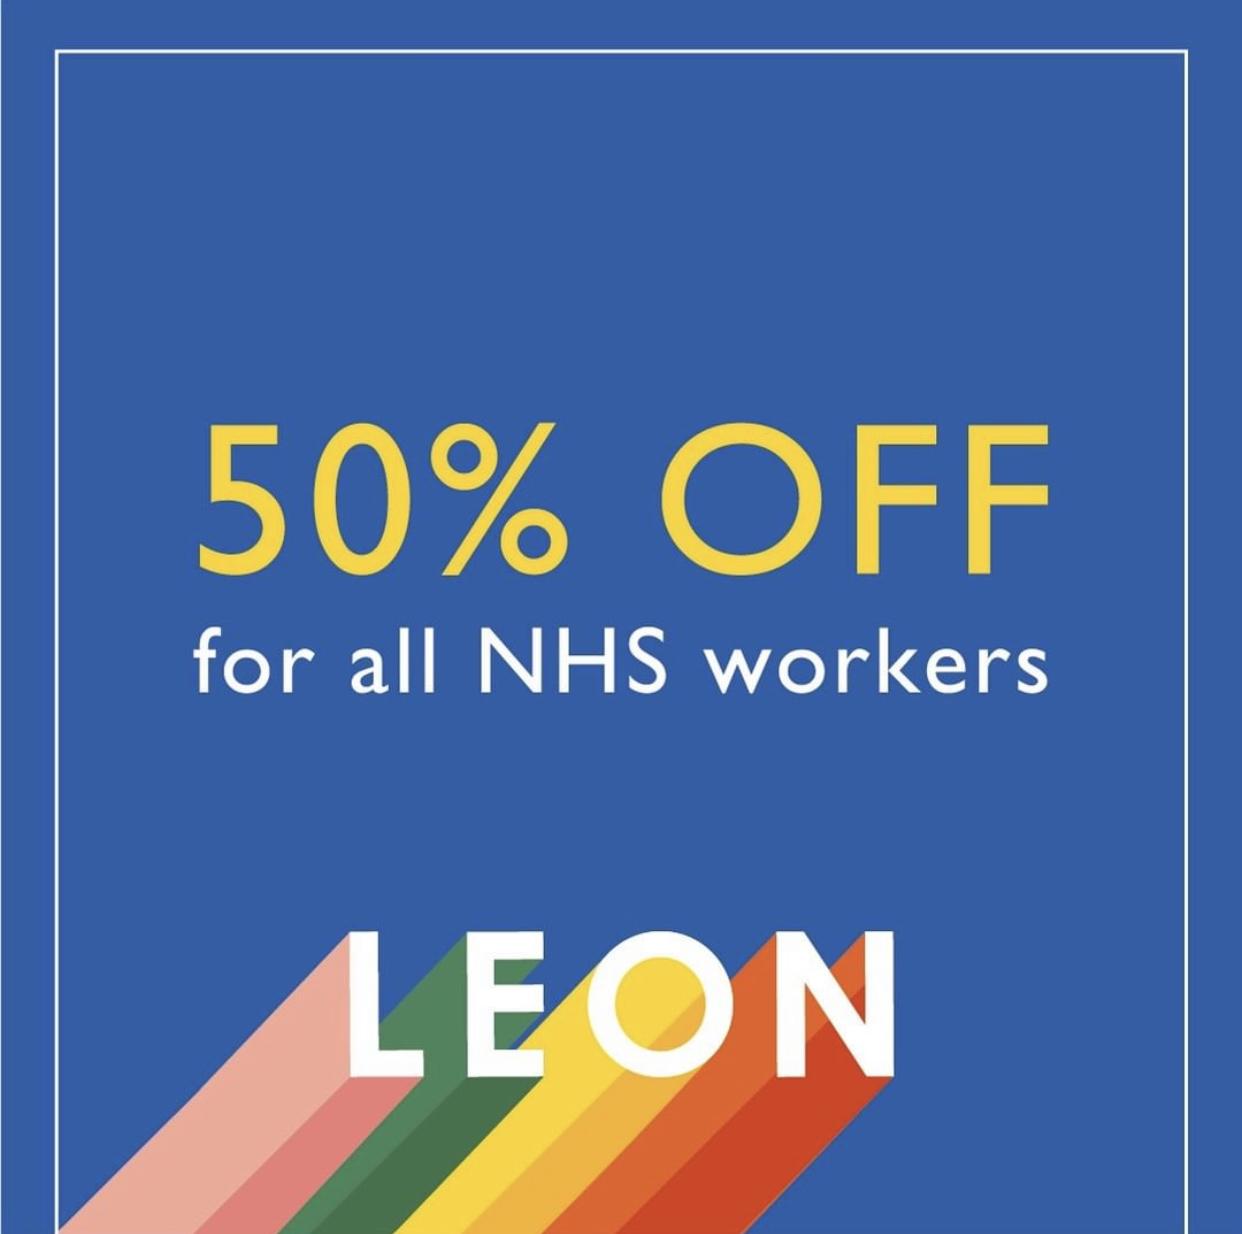 Leon's NHS Discount